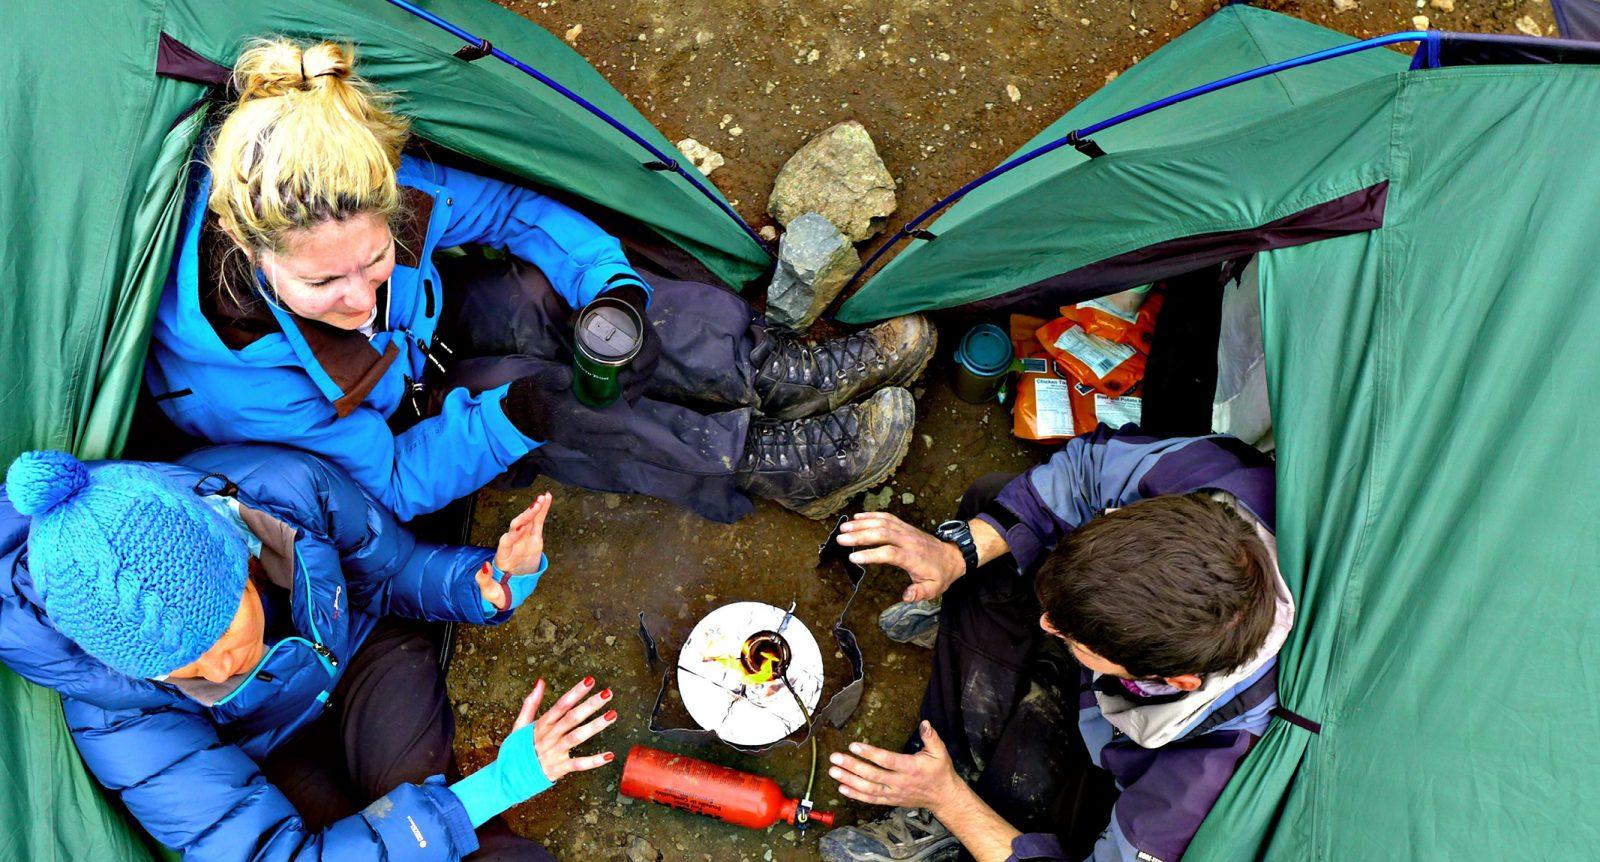 Team-centred ethos Secret Compass tents Iraqi Kurdistan